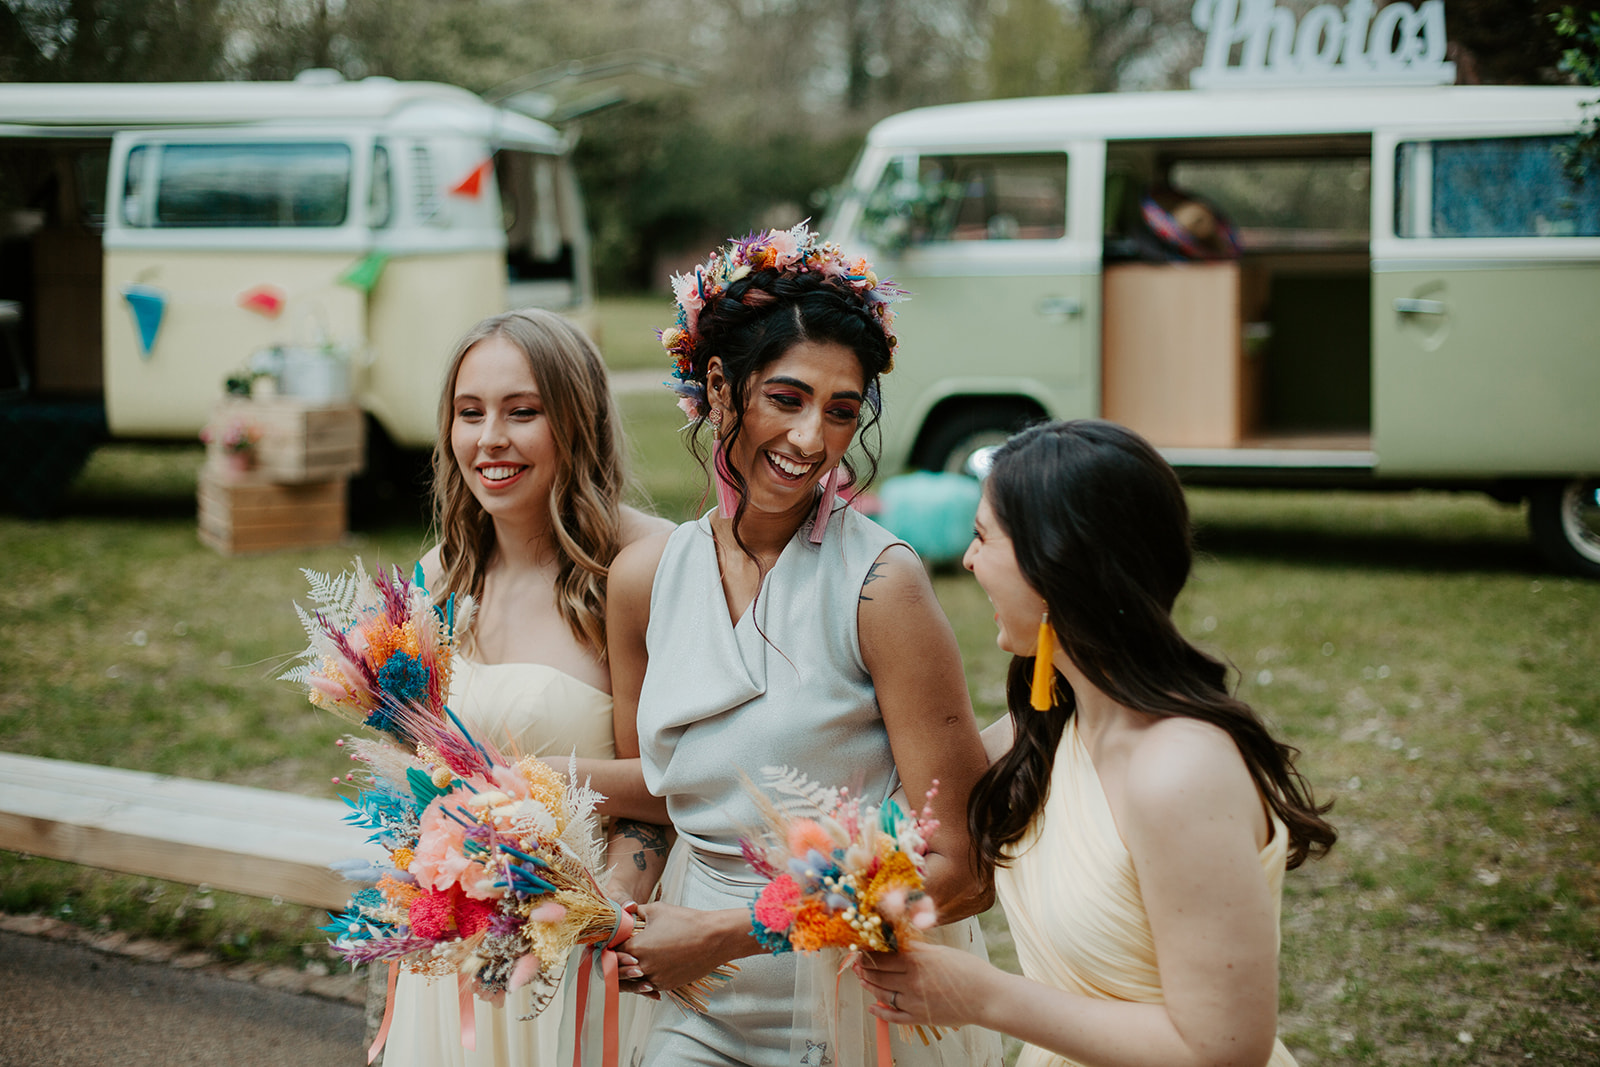 drive in wedding - camper van wedding - colourful wedding flowers - dried wedding flowers